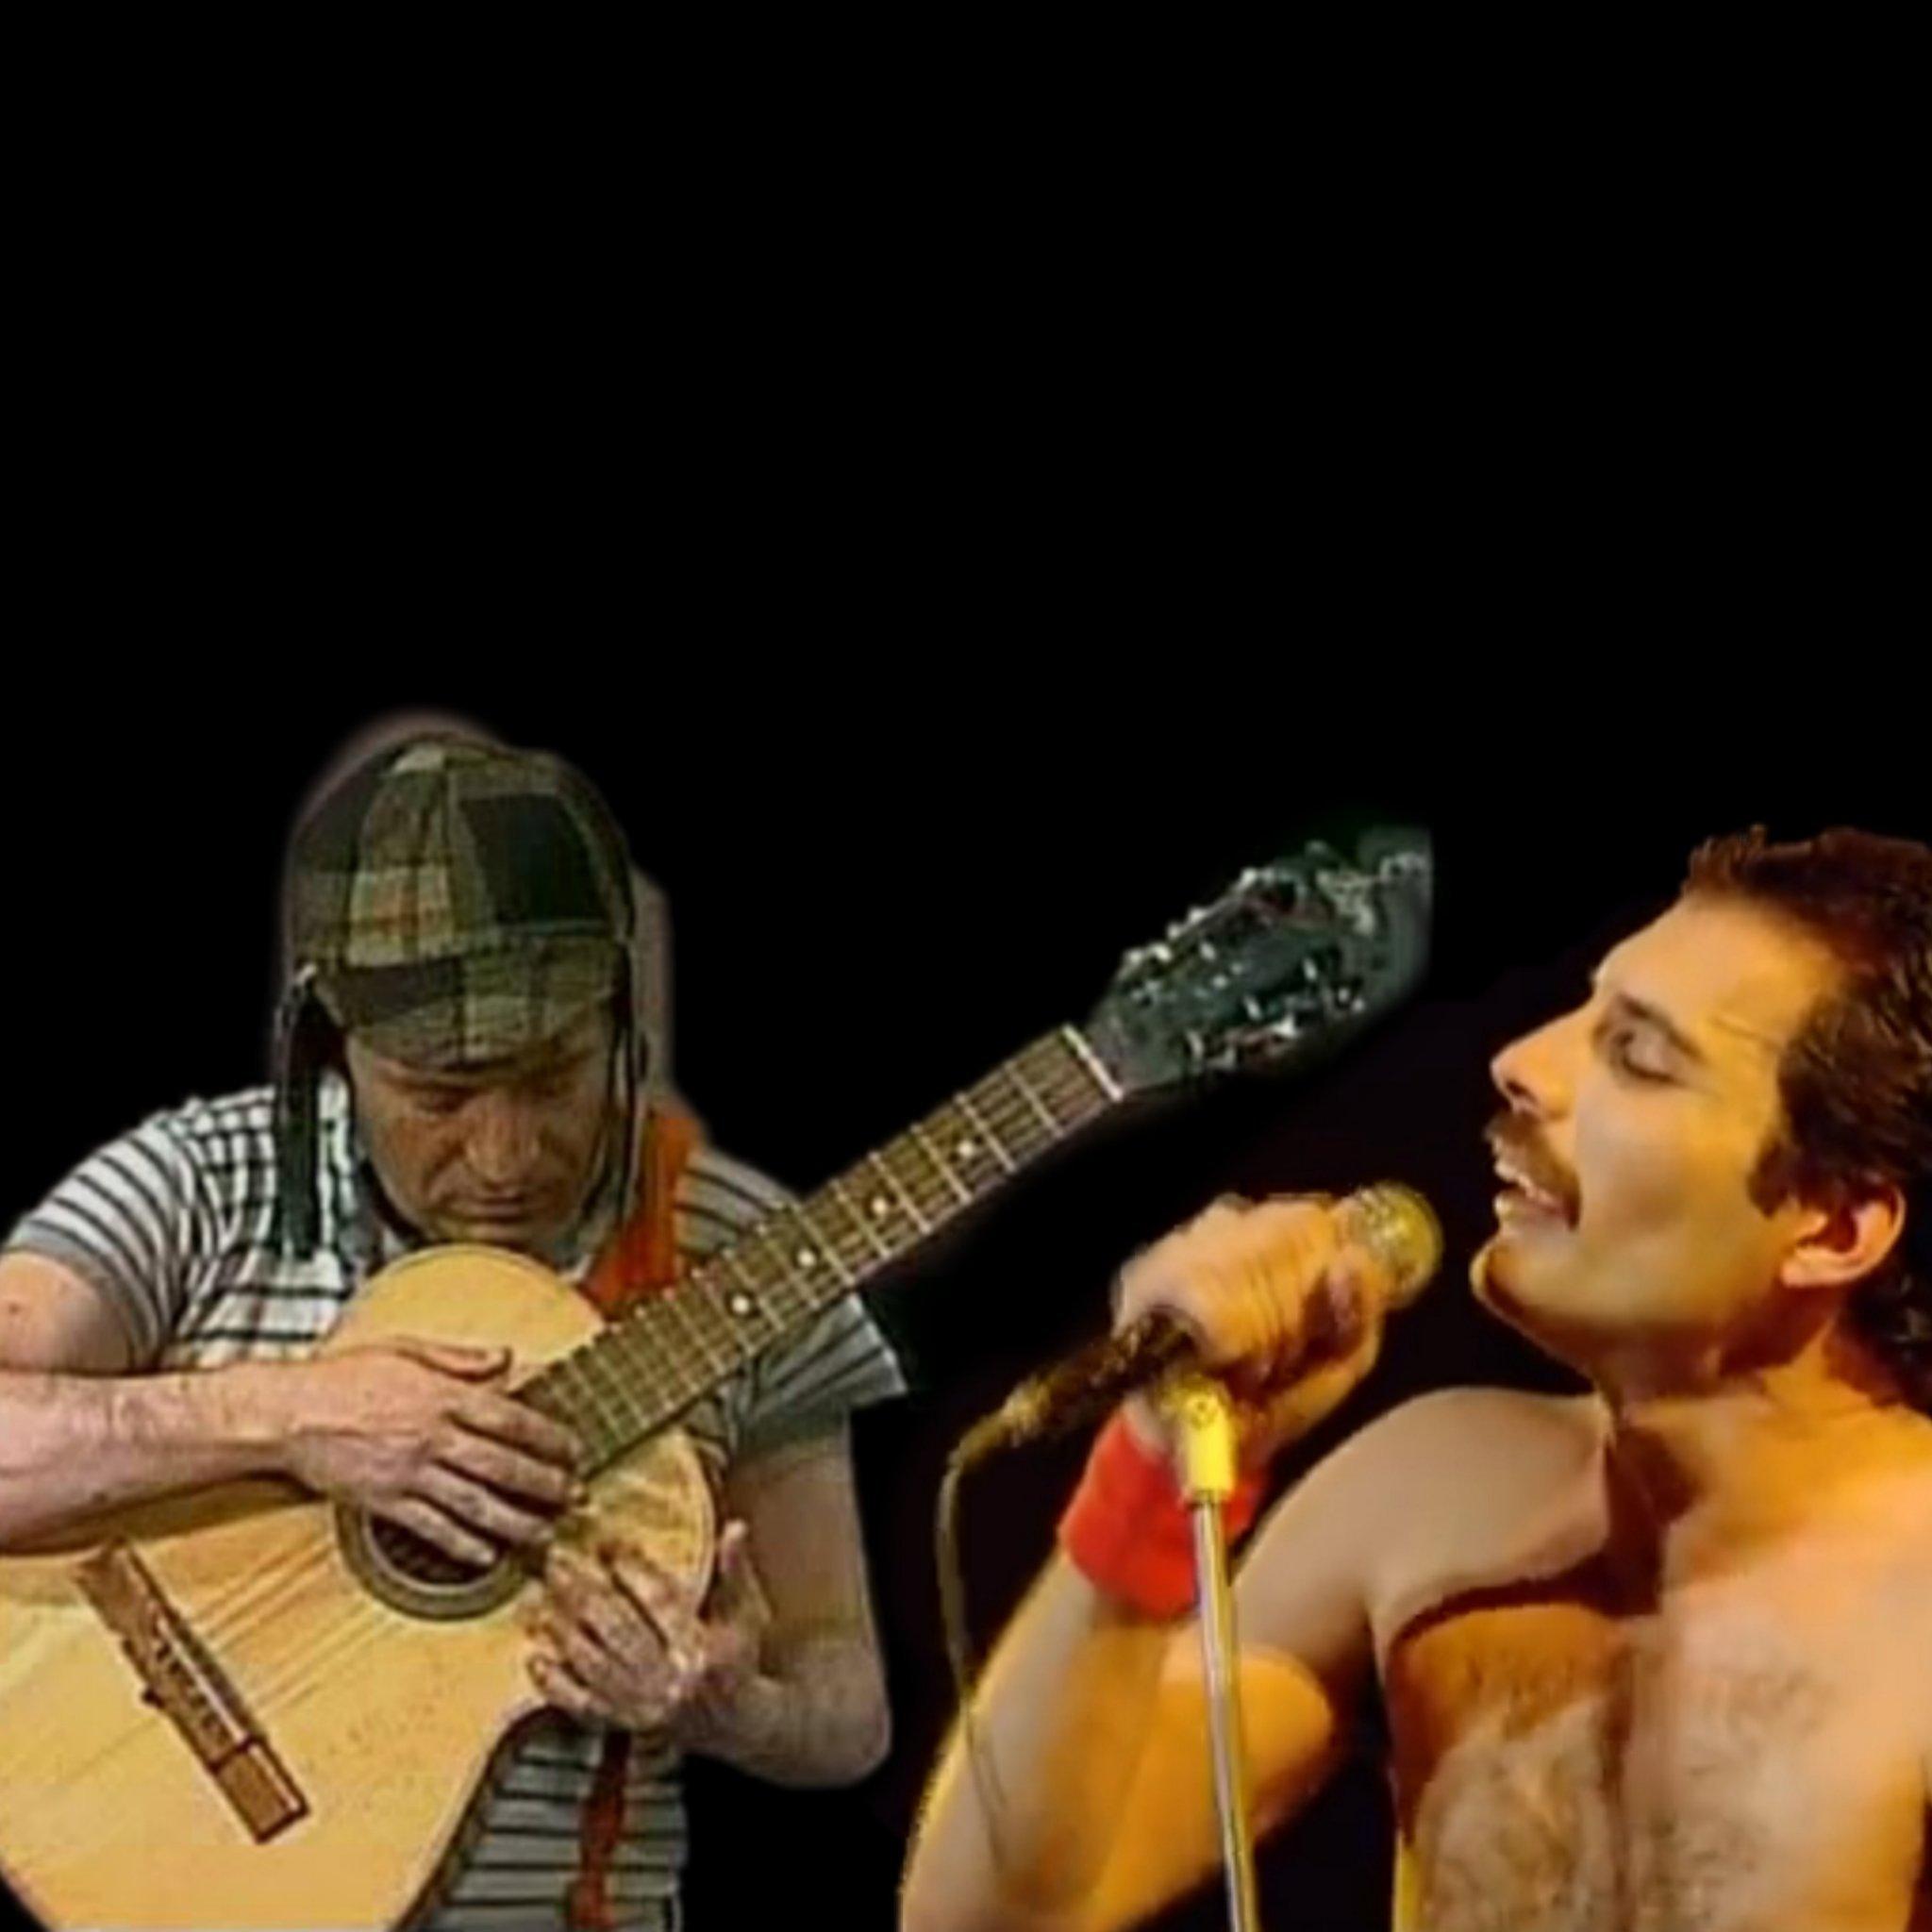 Que humilde Freddie - meme